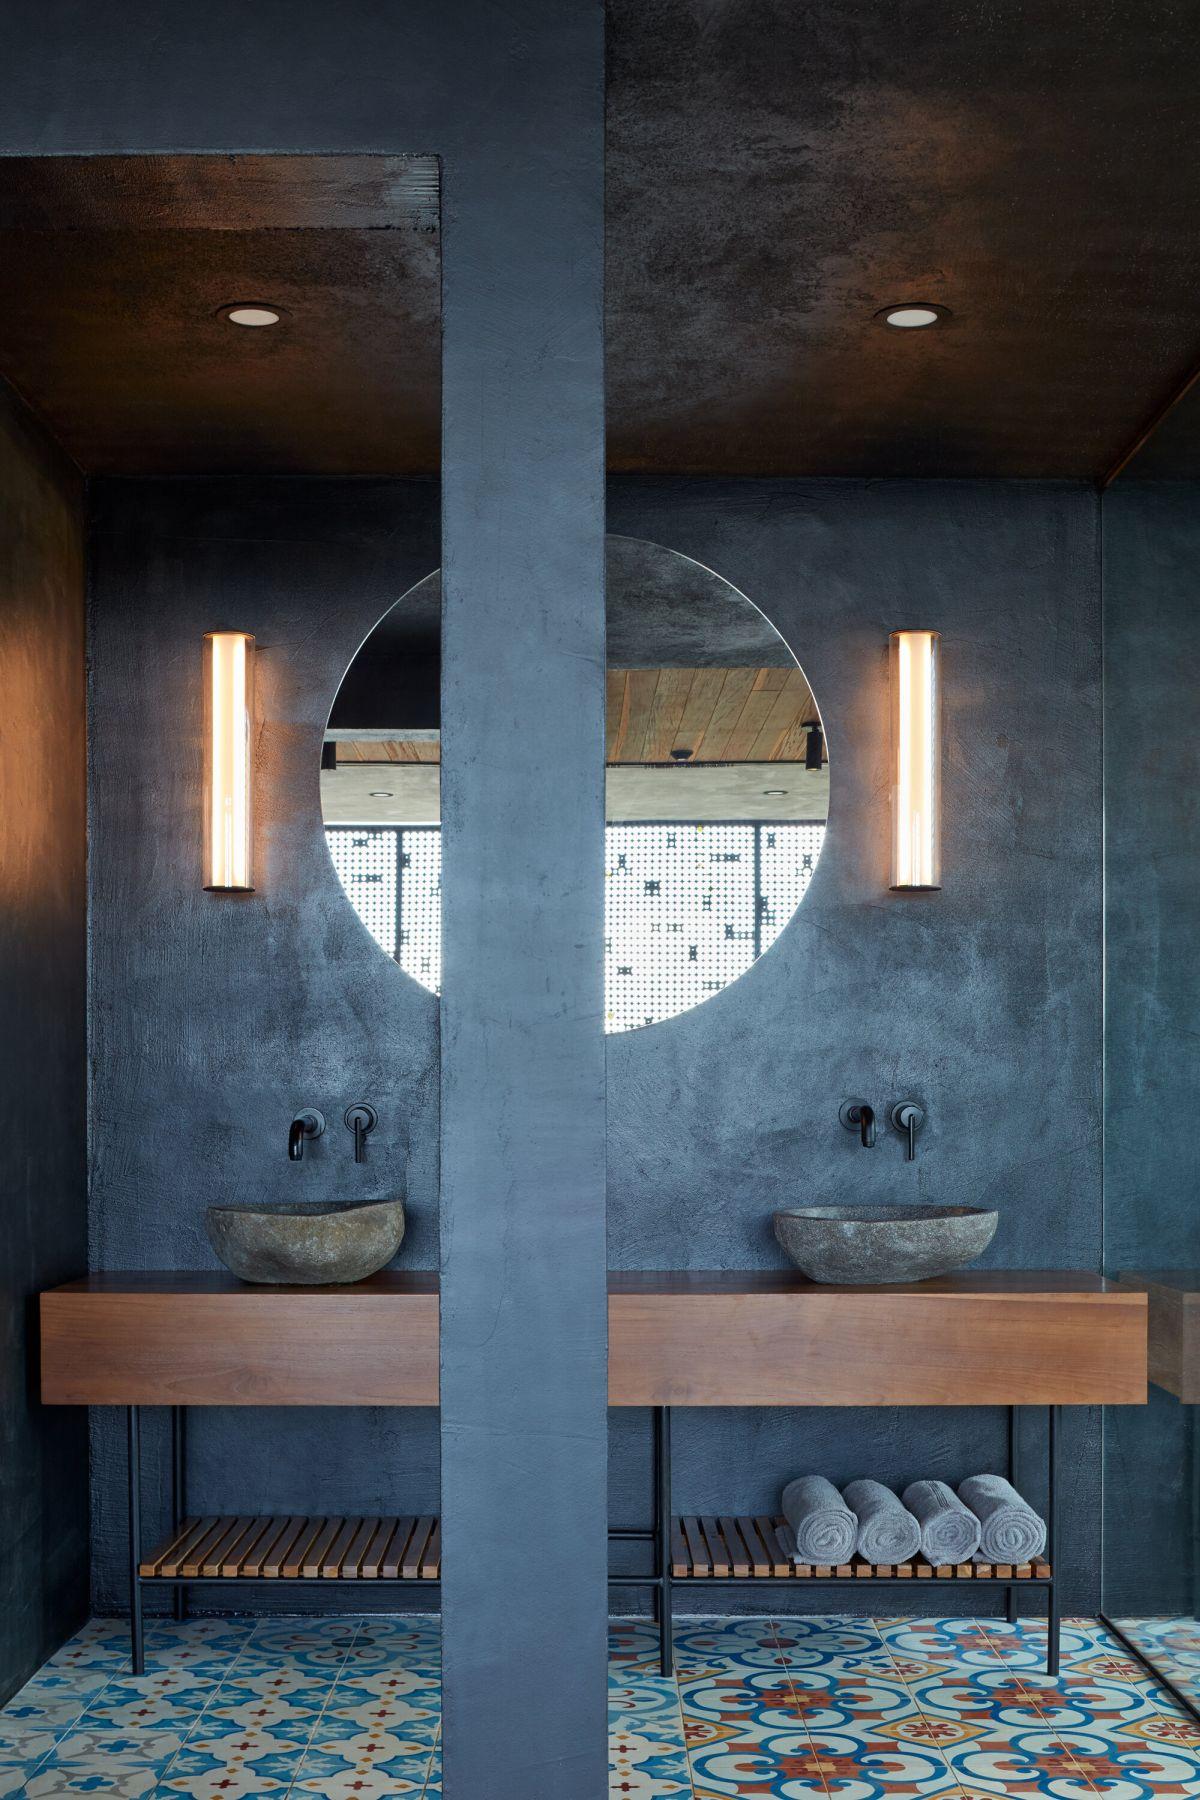 concrete looks great in an industrial bathroom